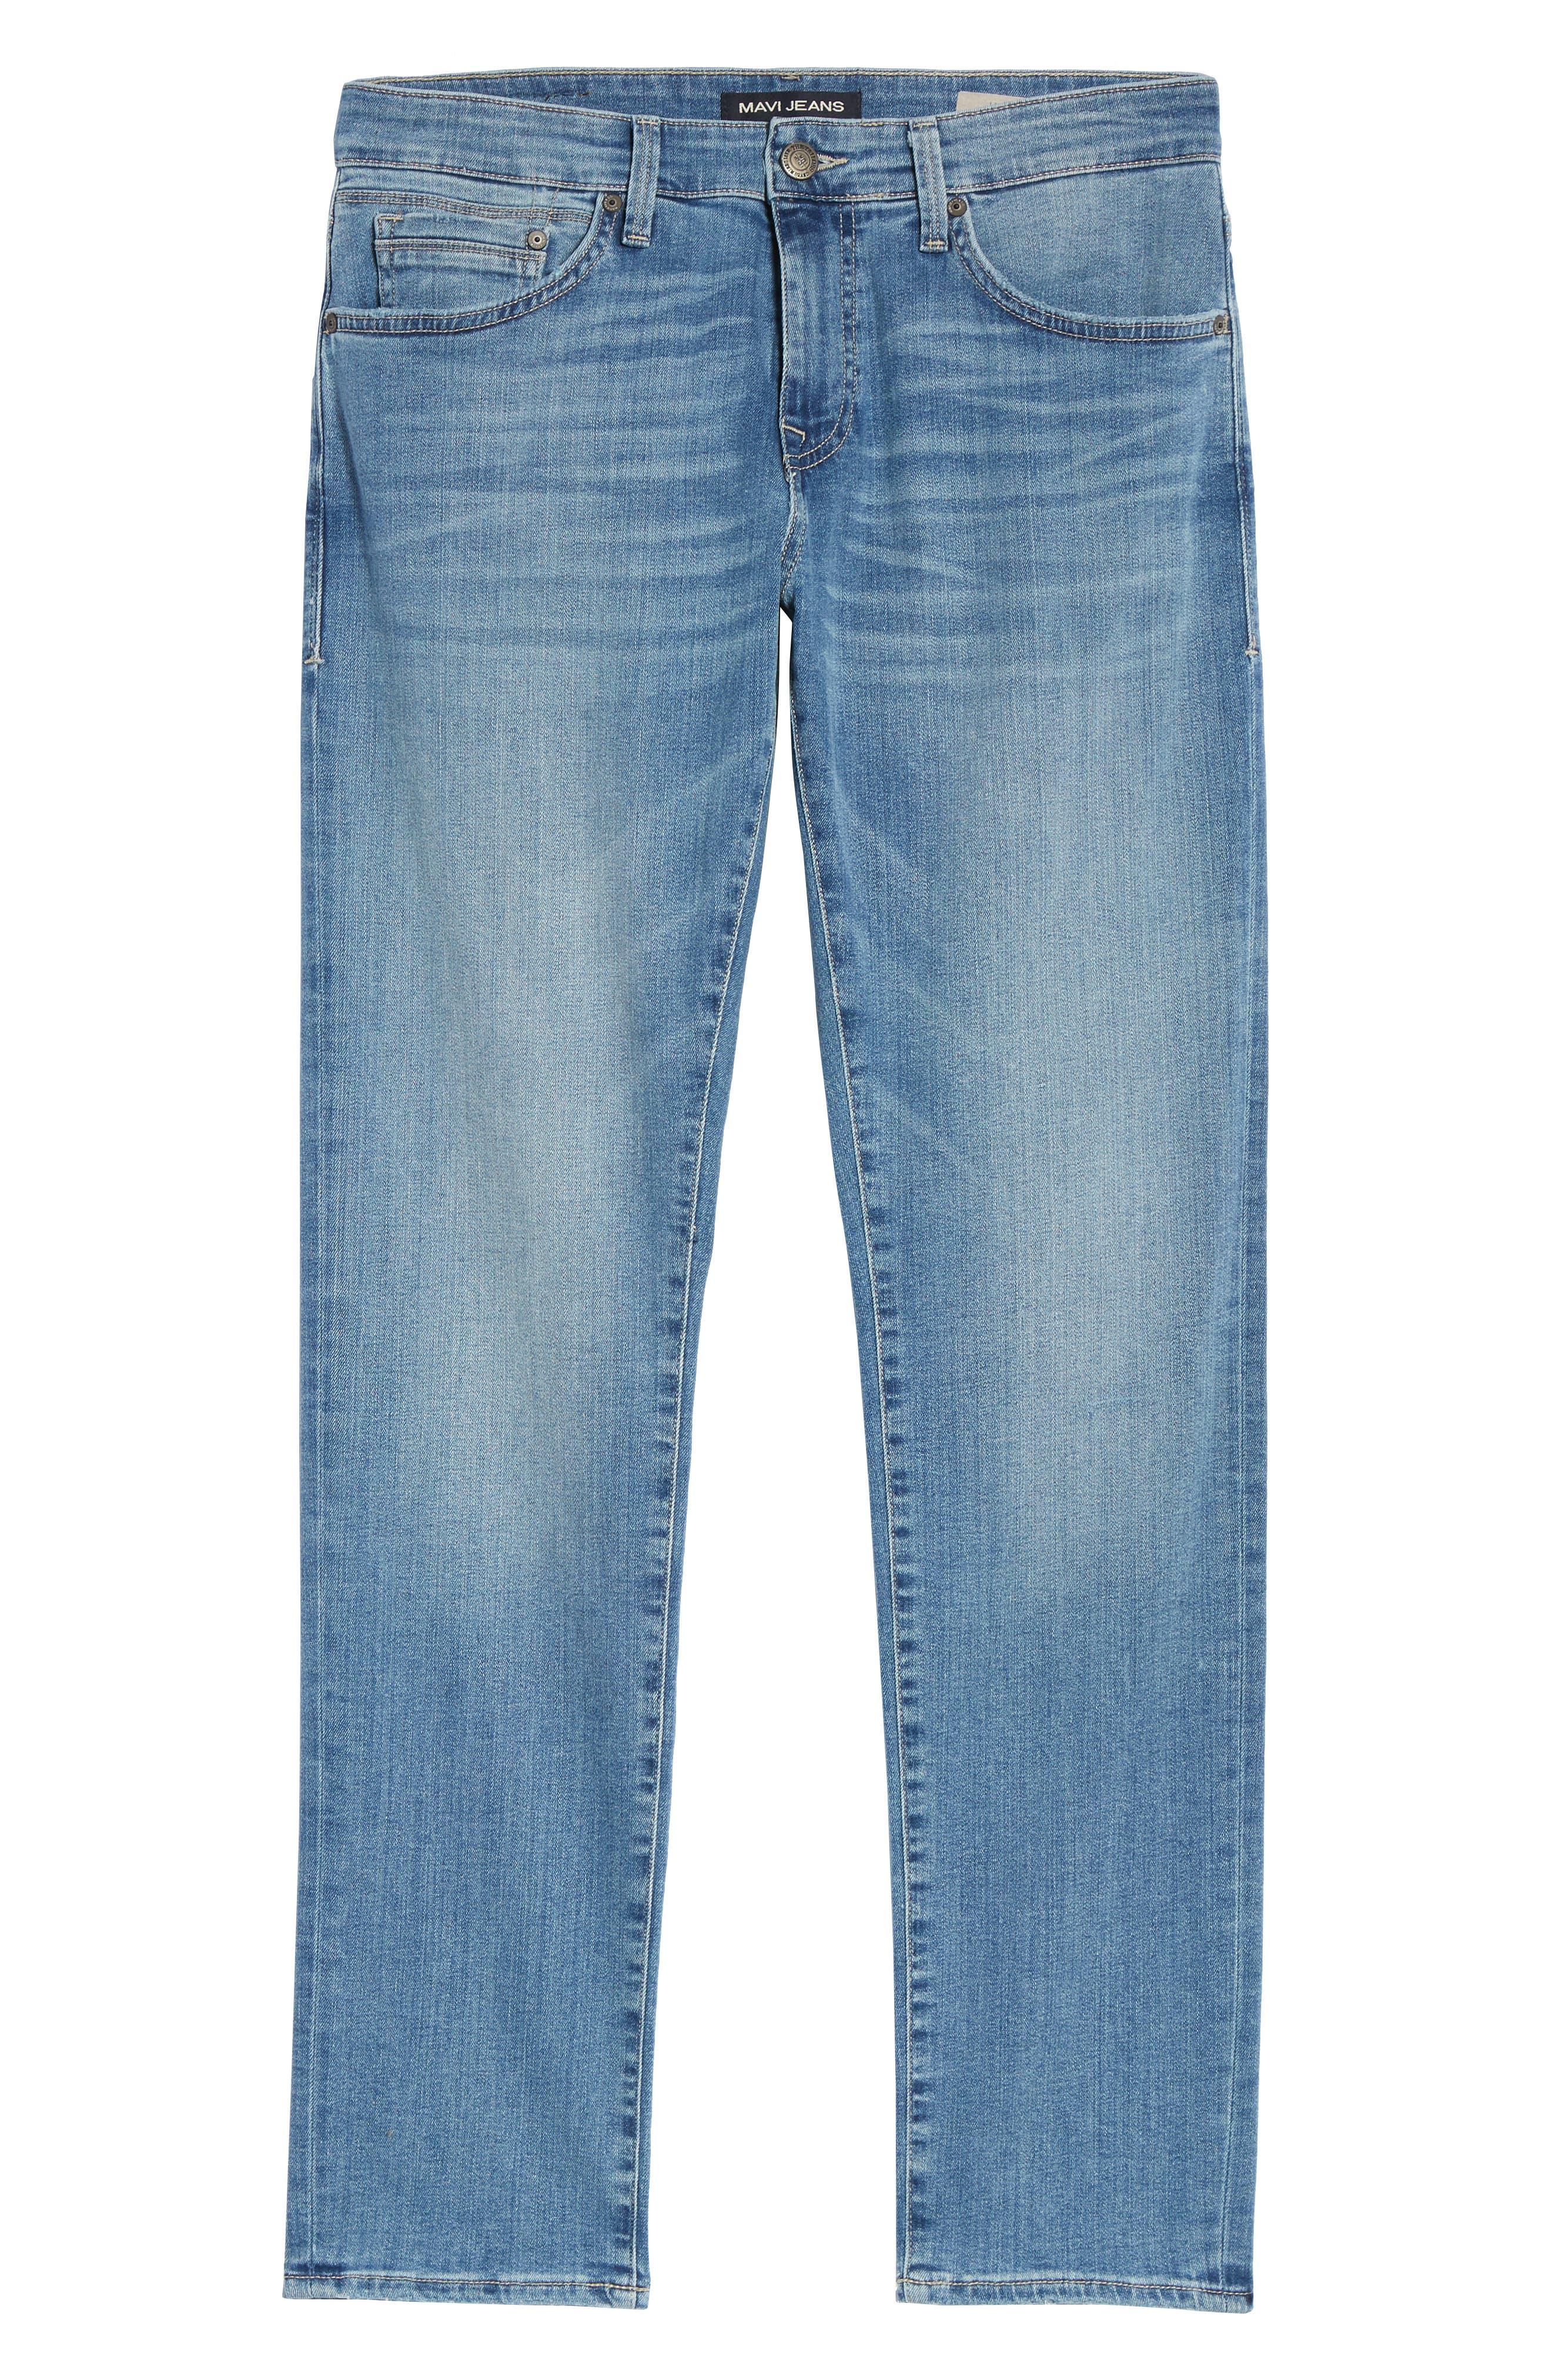 Jake Slim Fit Jeans,                             Alternate thumbnail 6, color,                             Light Blue Willamsburg